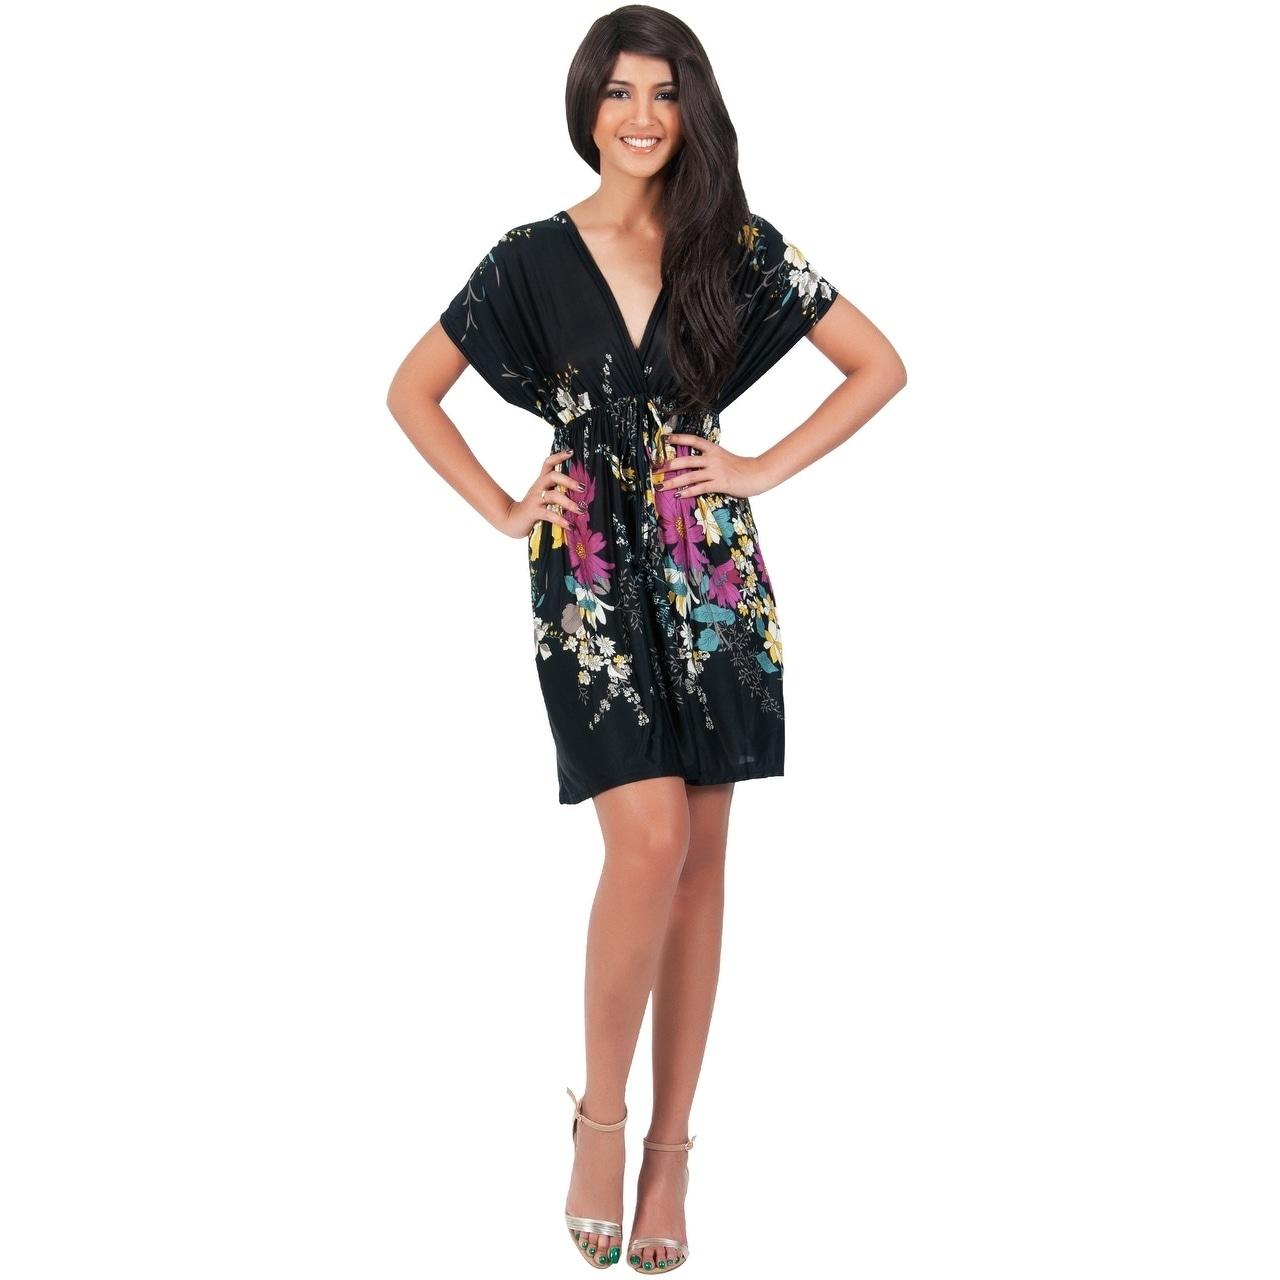 44feec23fff9 Shop KOH KOH Short Kimono Sleeve Floral Print Cover Up Kaftan Mini Dress -  Ships To Canada - Overstock - 10835725